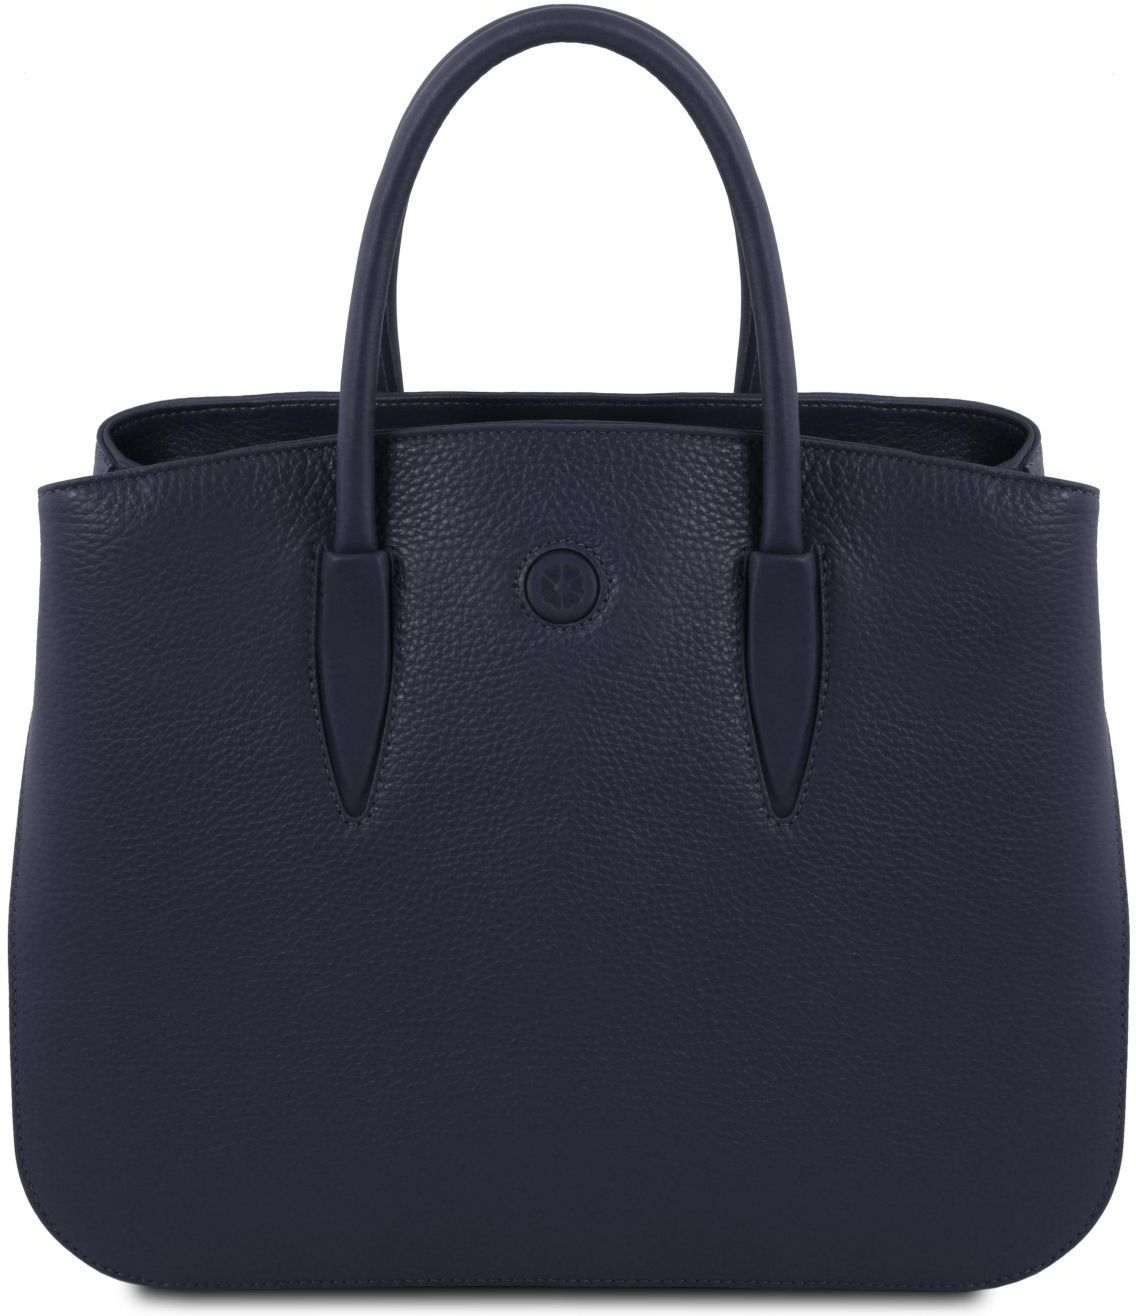 c8f09ba595 Γυναικεία Τσάντα Δερμάτινη Camelia Μπλε σκούρο Tuscany Leather